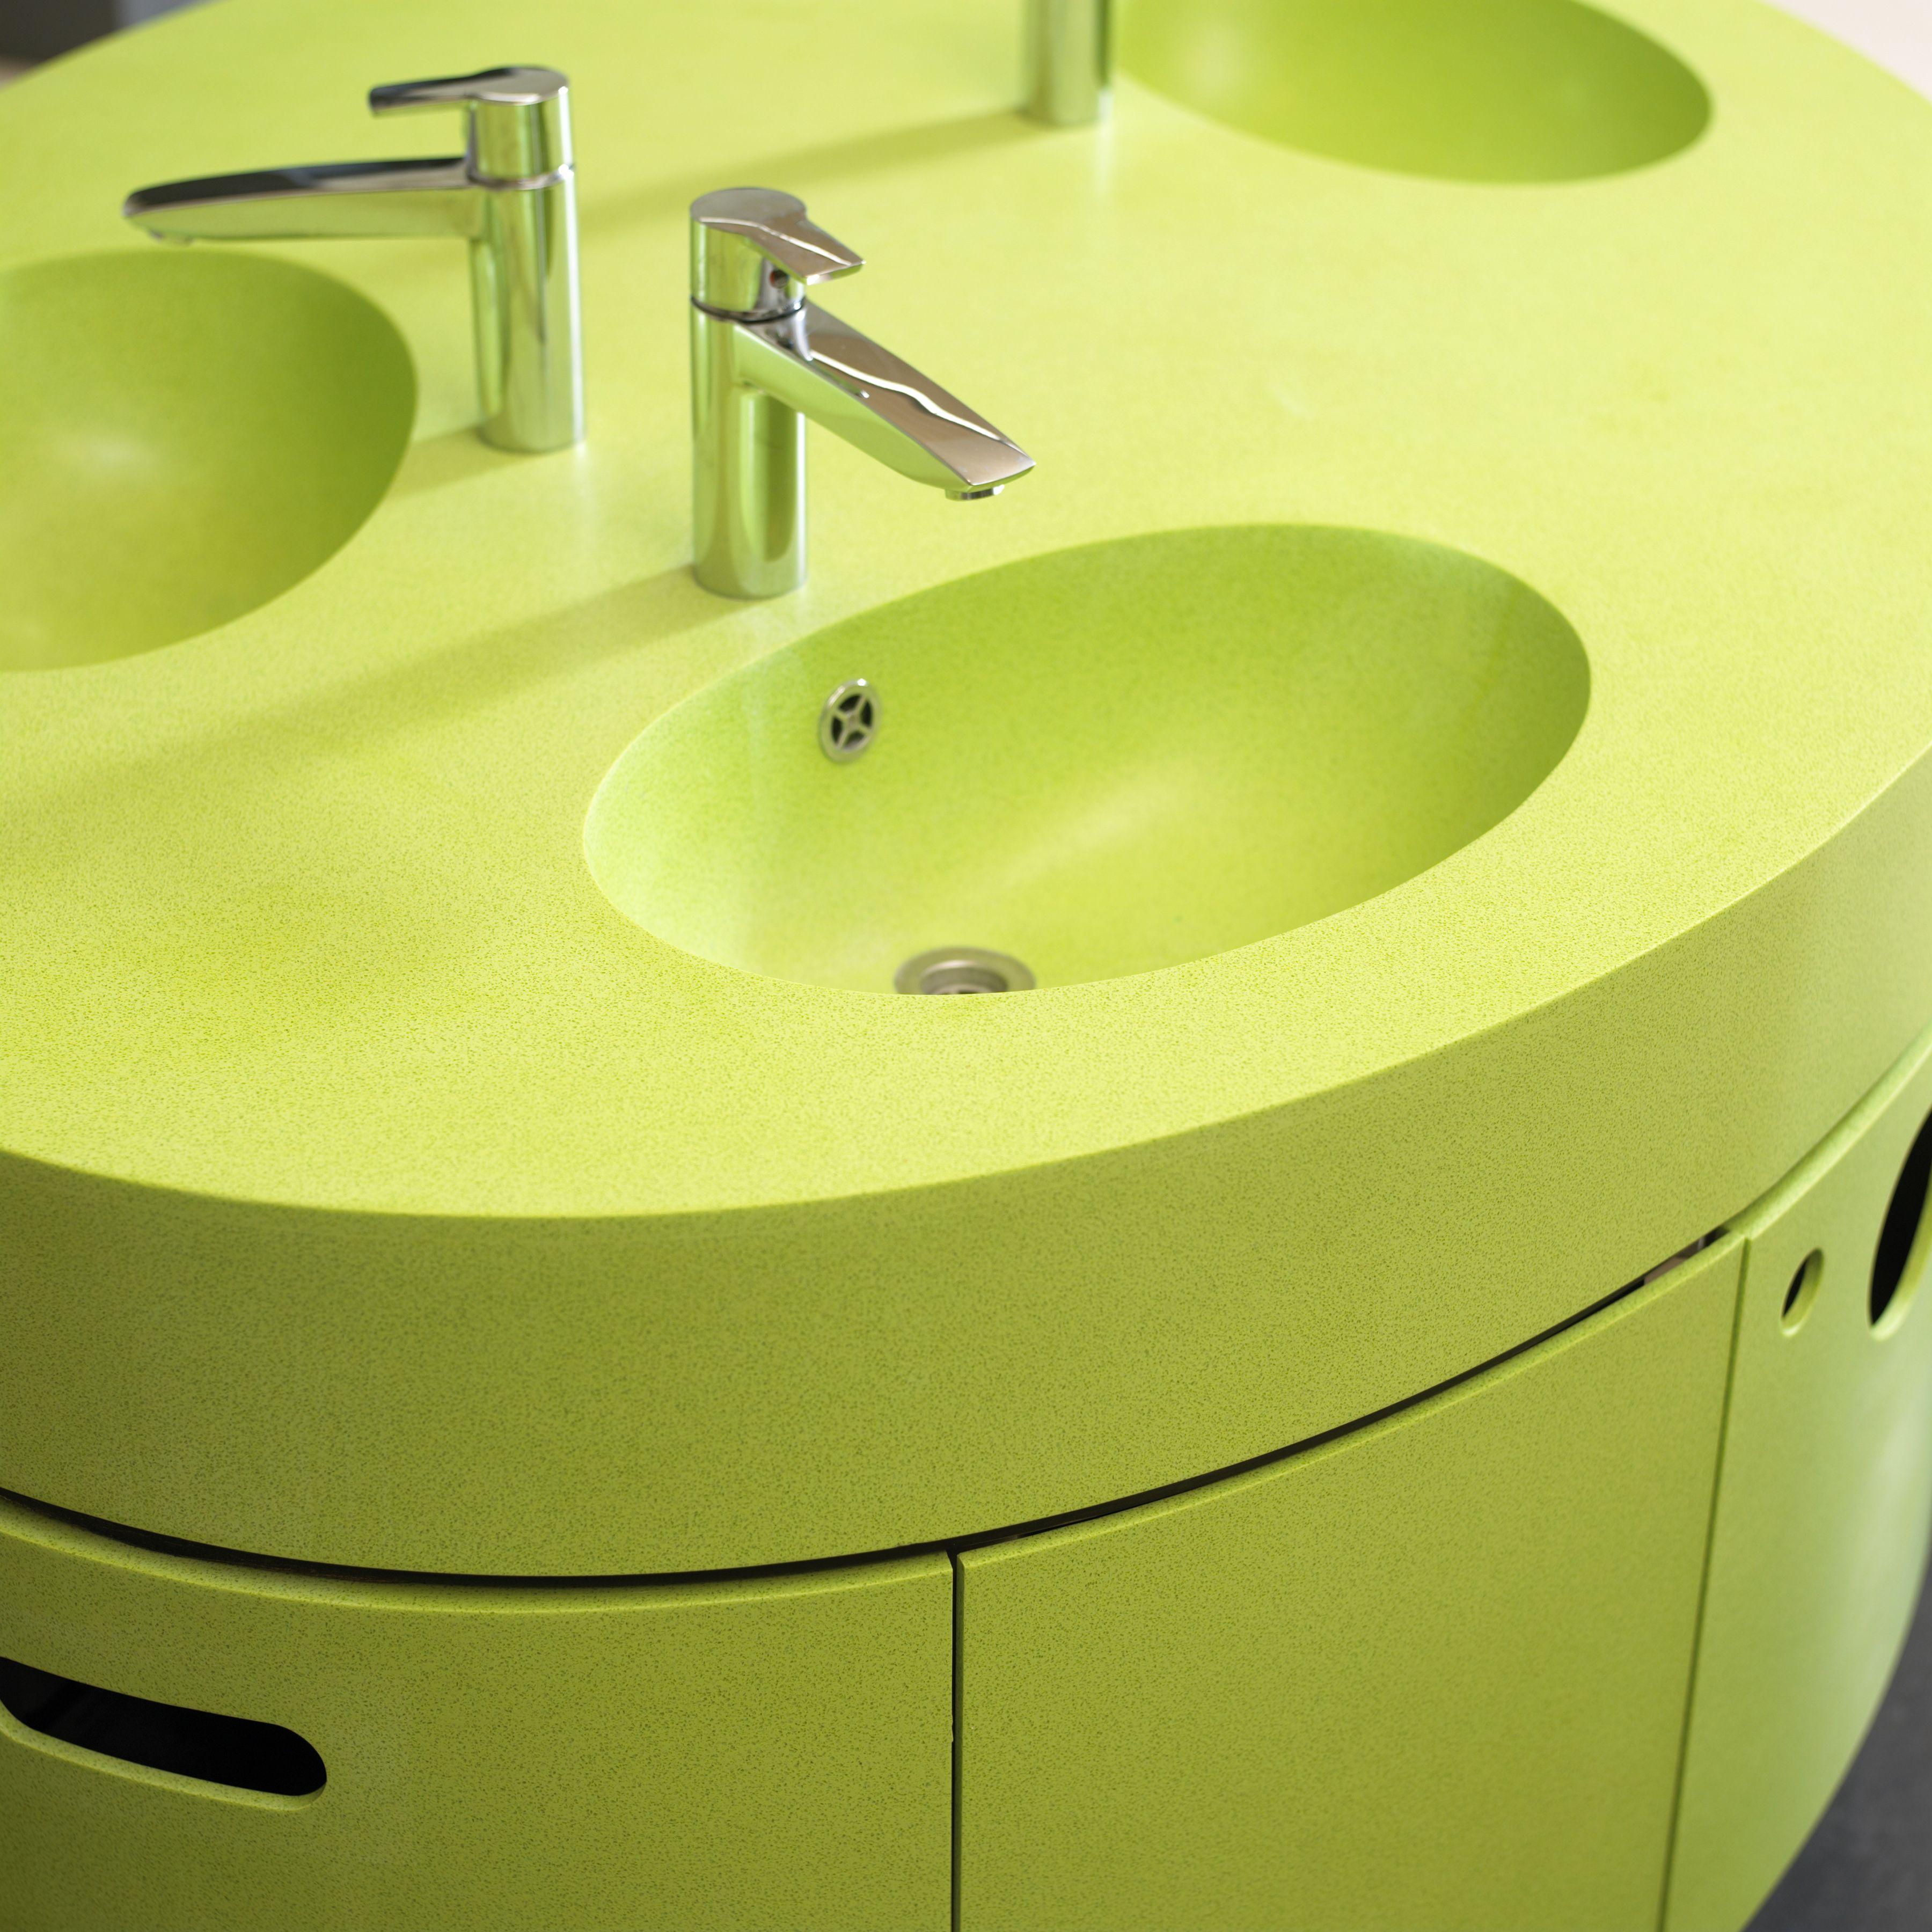 School Bathrooms durat school bathroom basin | bathrooms | pinterest | bathroom basin